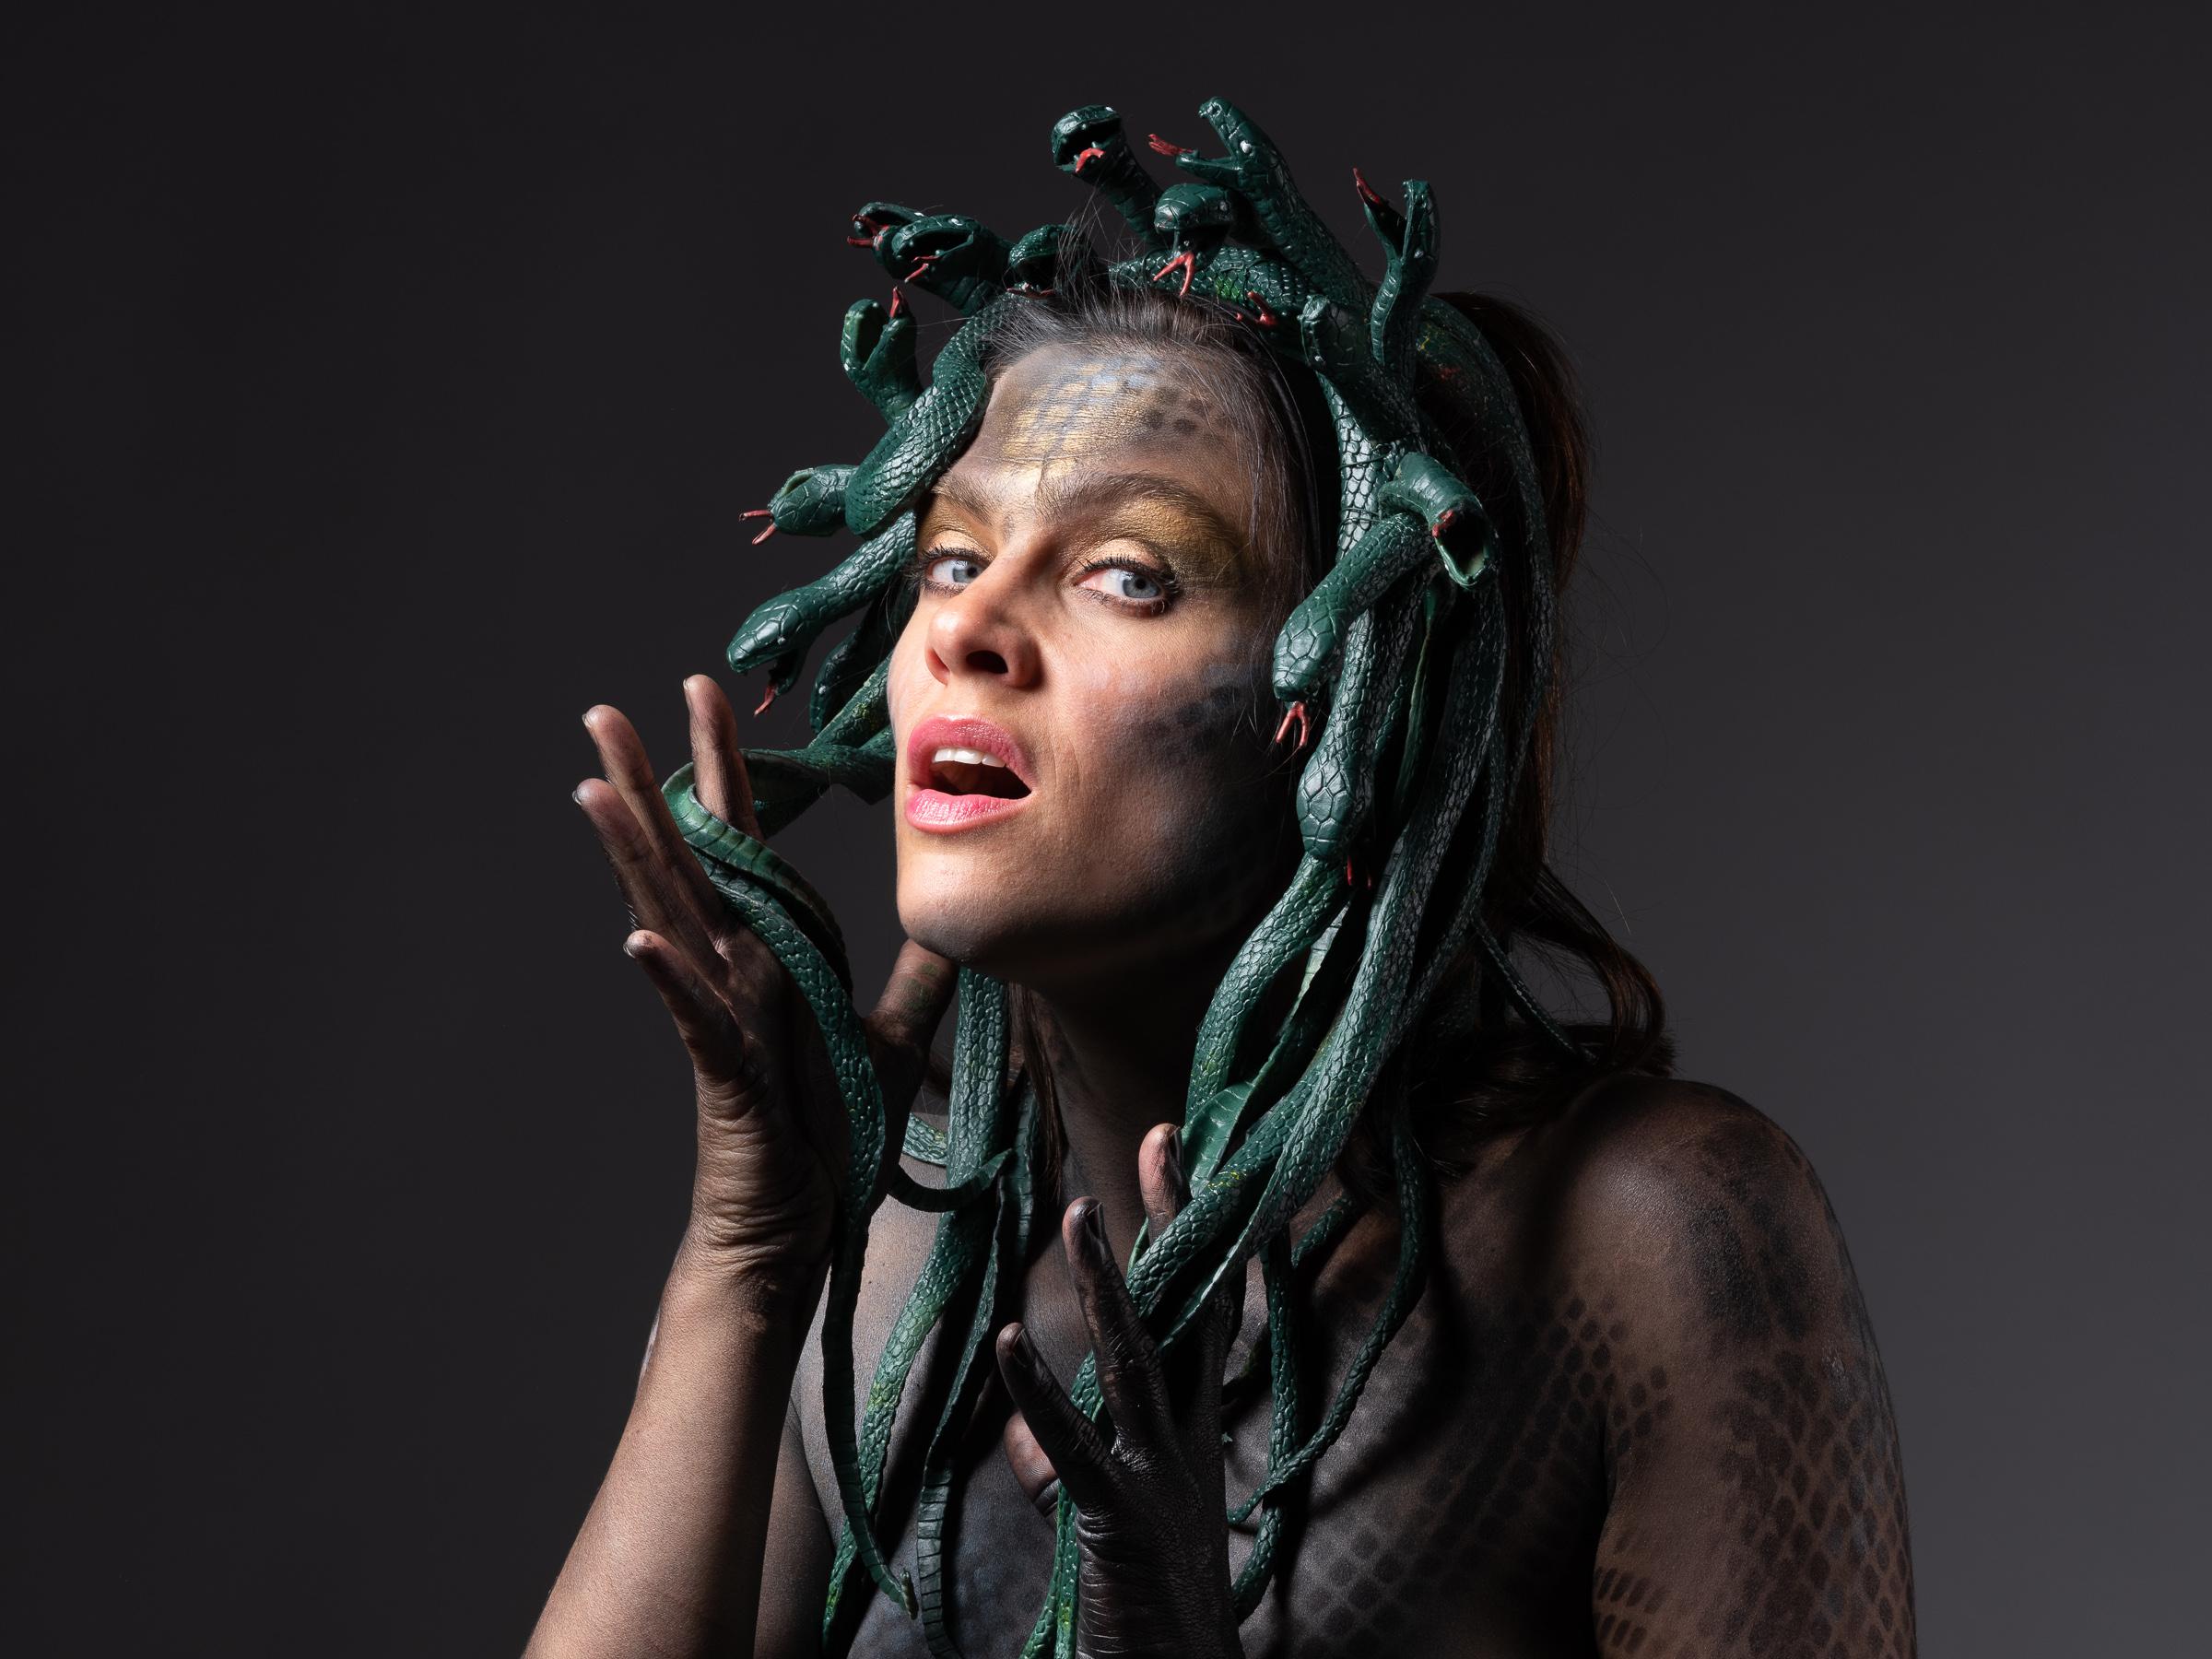 Nina Burri Medusa by STEMUTZ, Fribourg, 11.08.2020